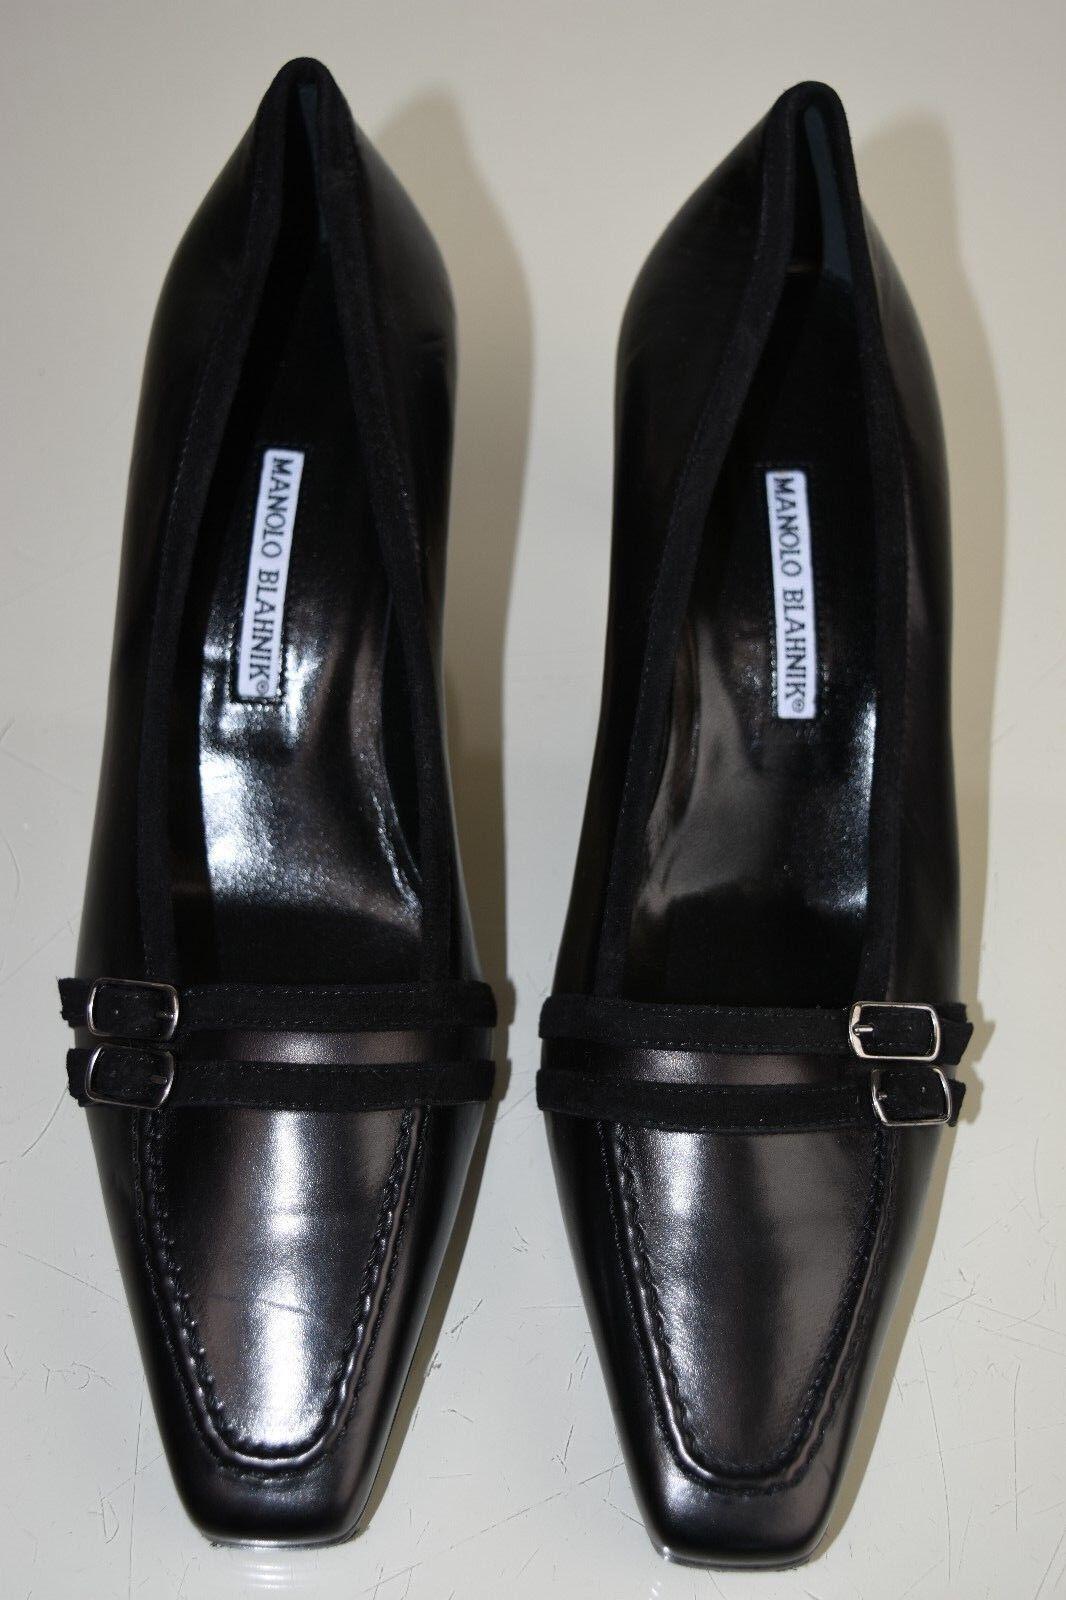 785 NEW MANOLO BLAHNIK PUMPS nero LEATHER Low HEELS scarpe 39.5 40.5